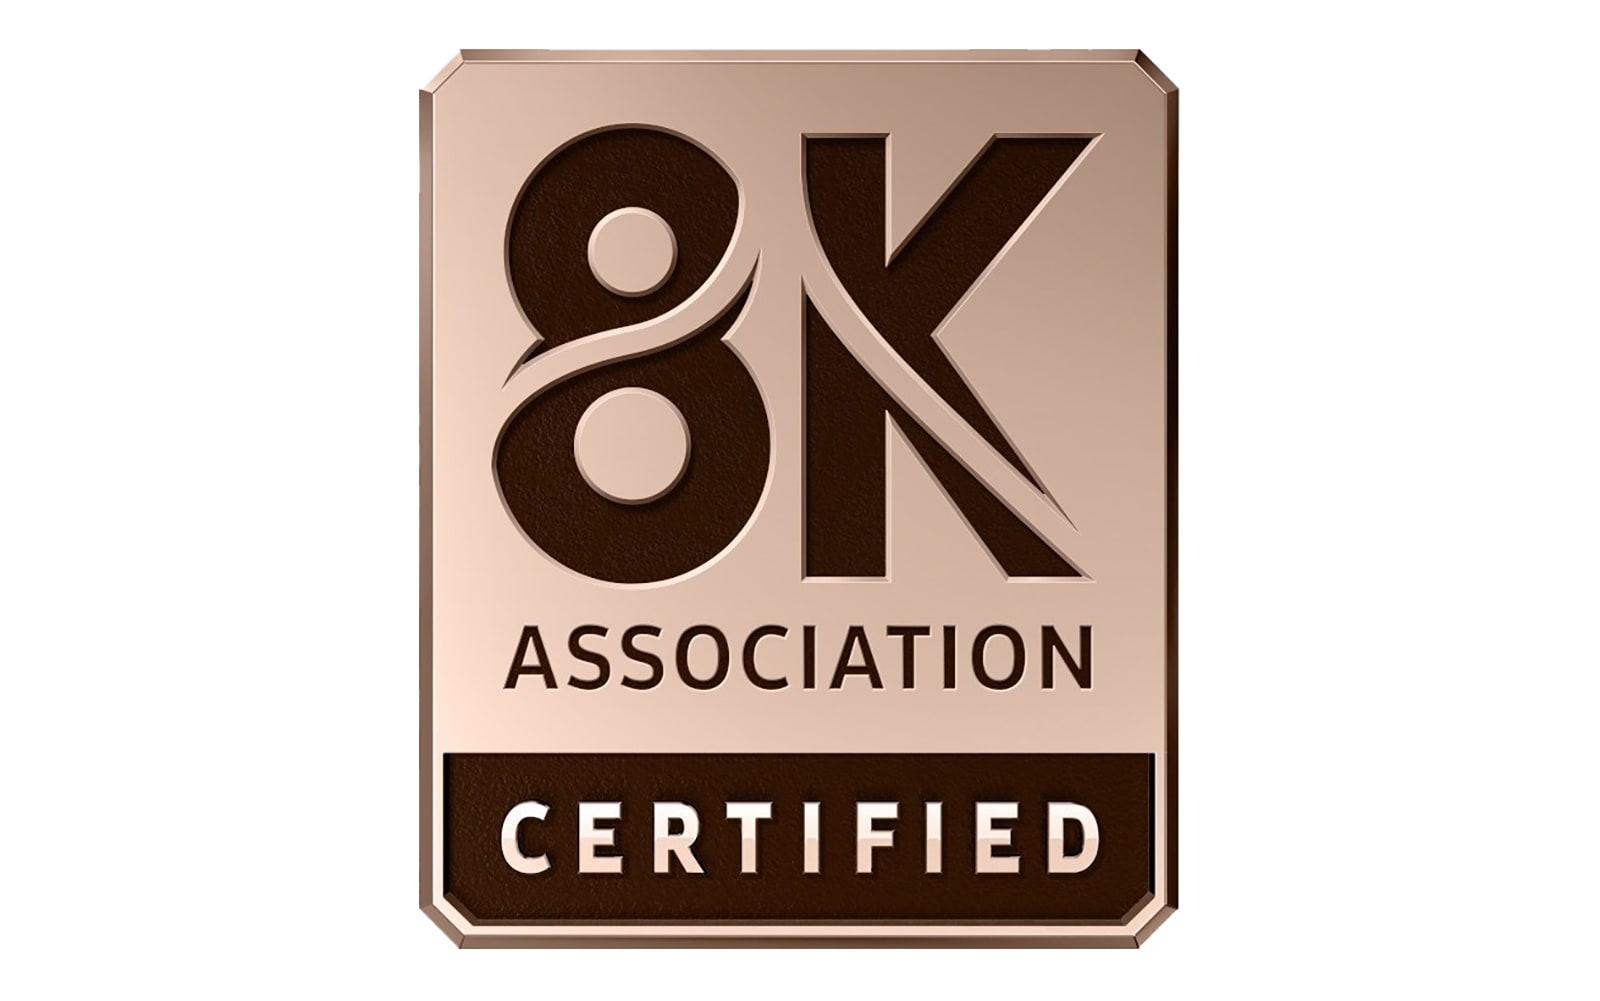 8K Association Certified